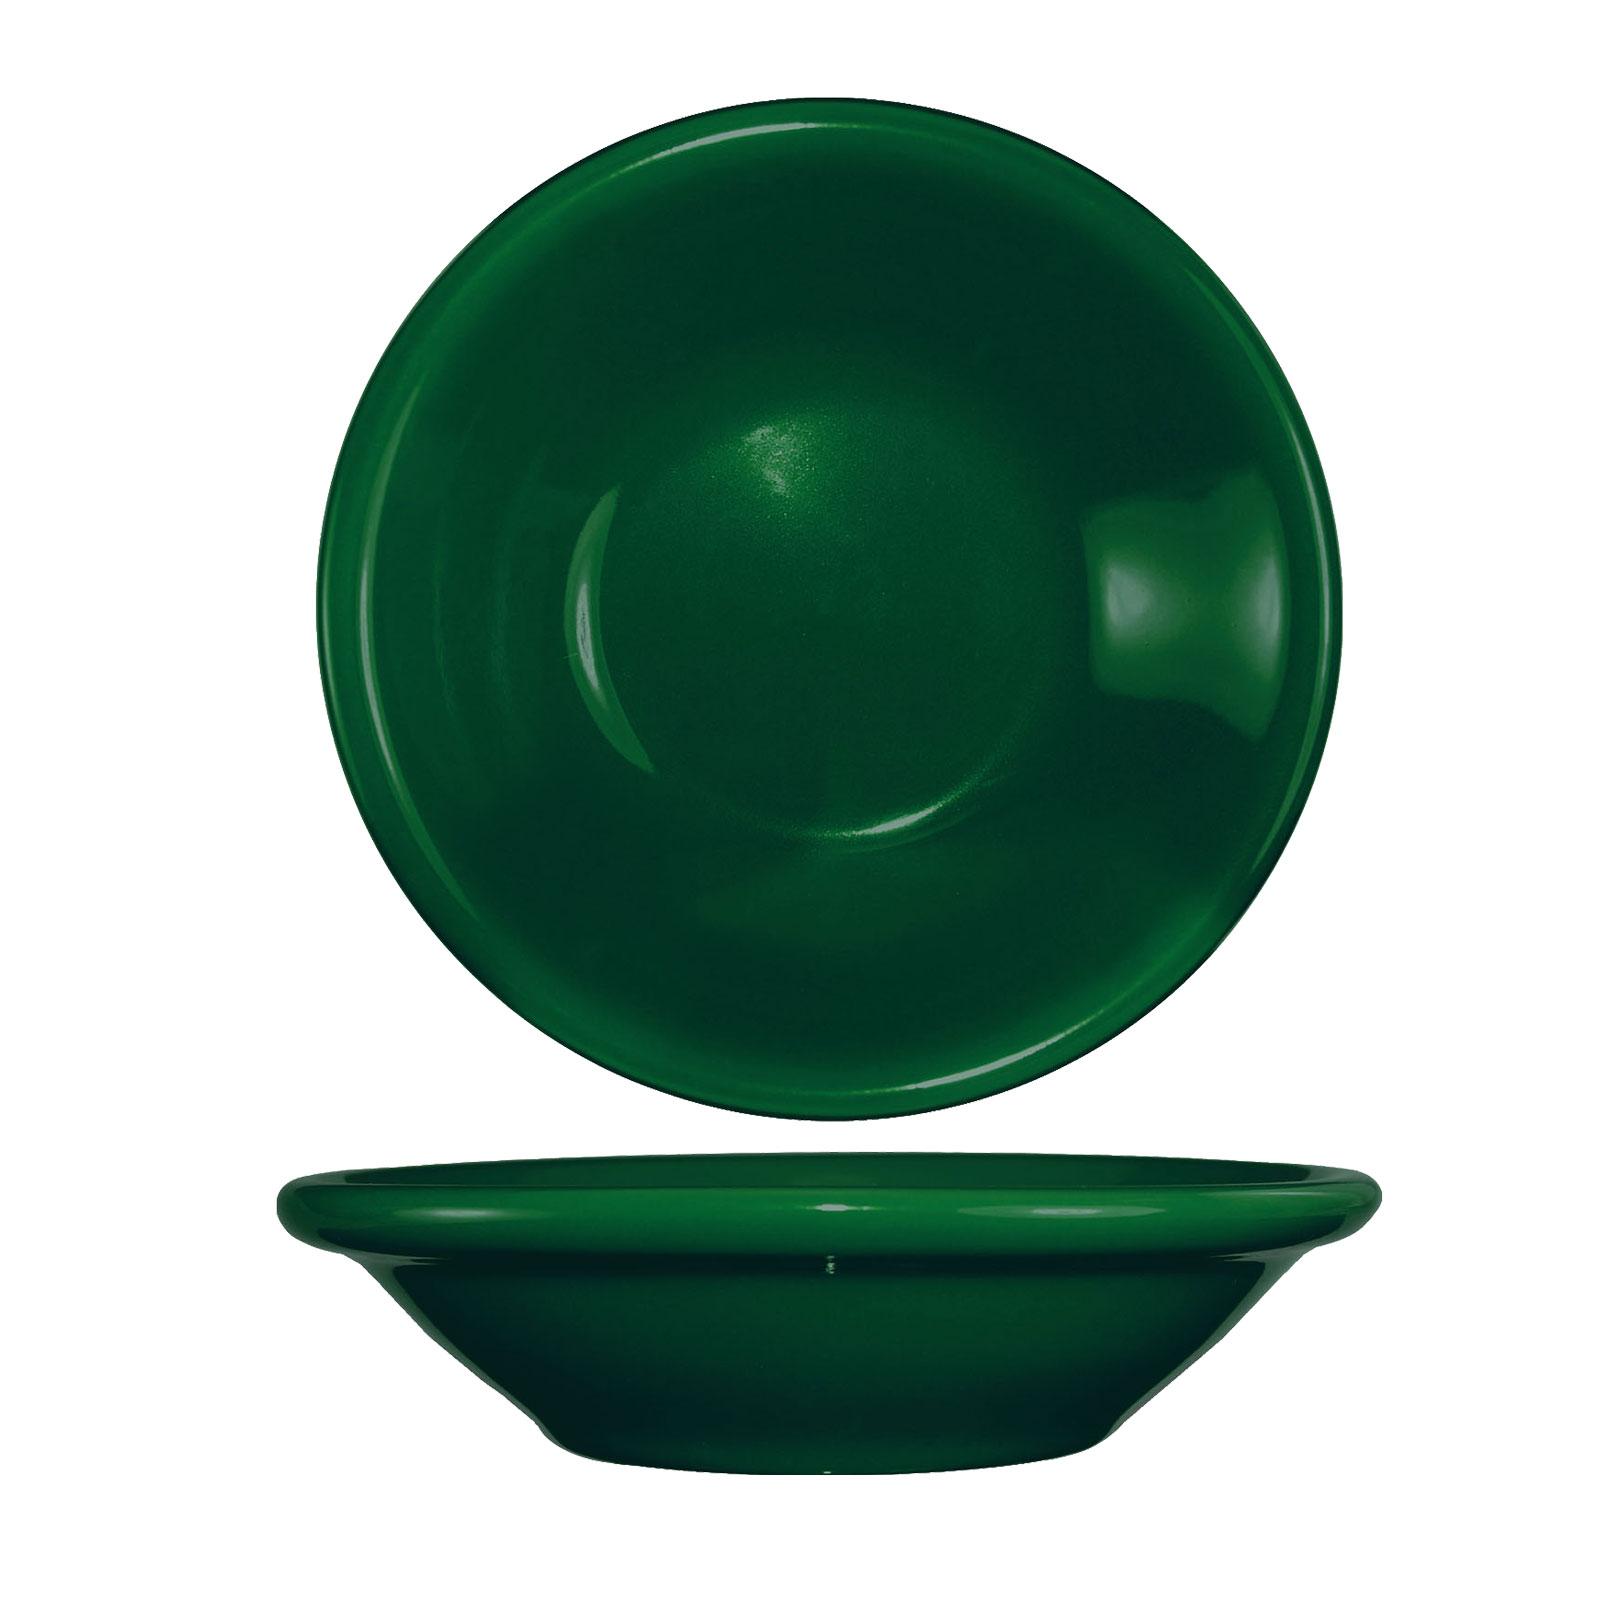 International Tableware CAN-11-G china, bowl,  0 - 8 oz